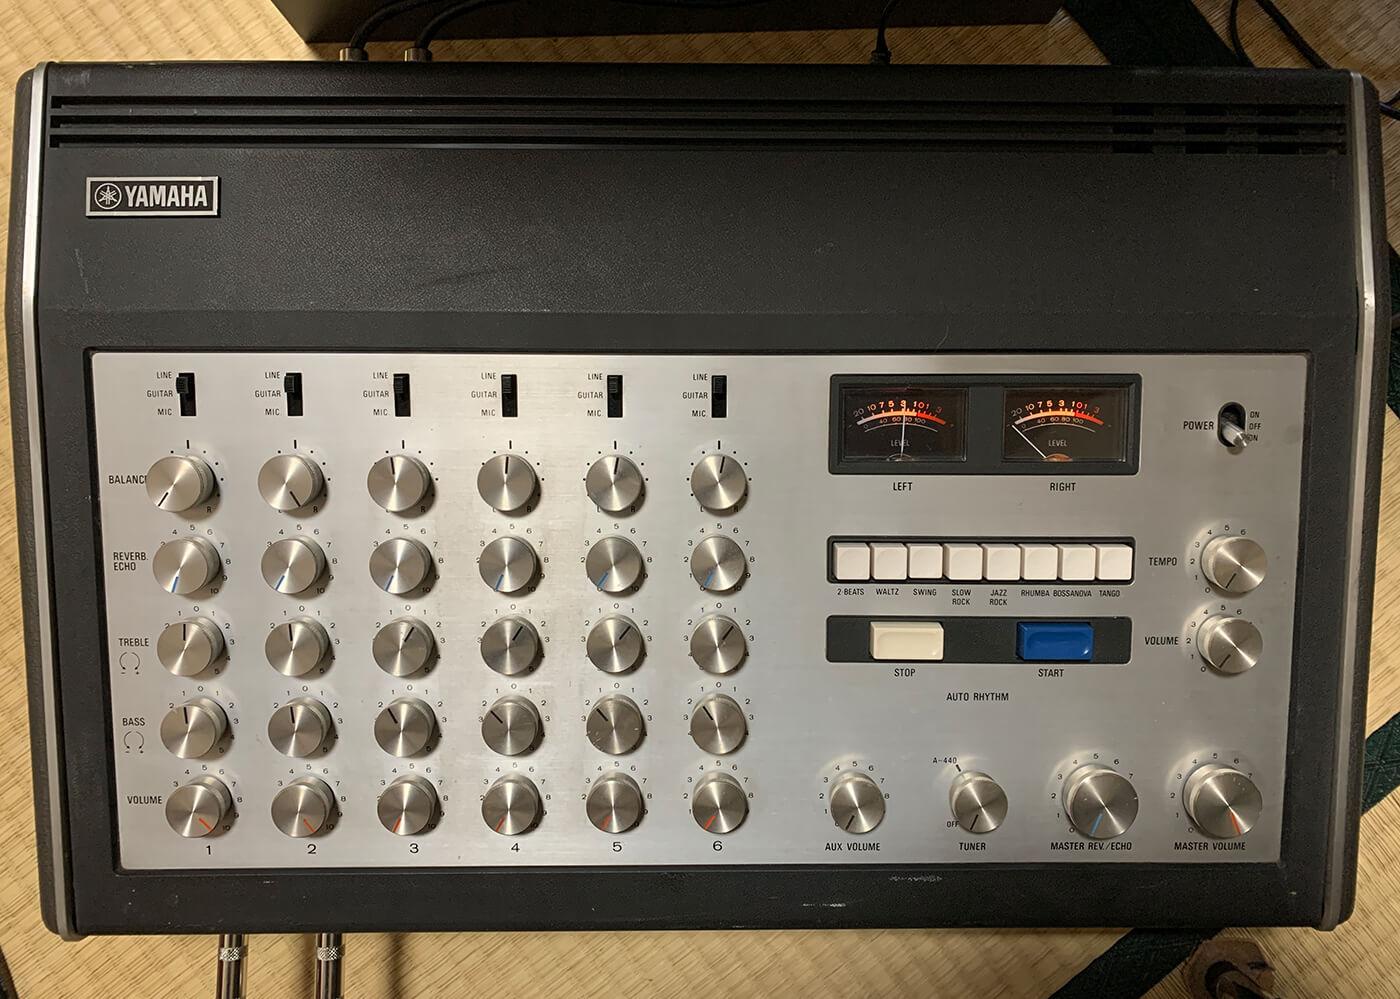 Analogue Sound With Vintage Mixer - Mixer